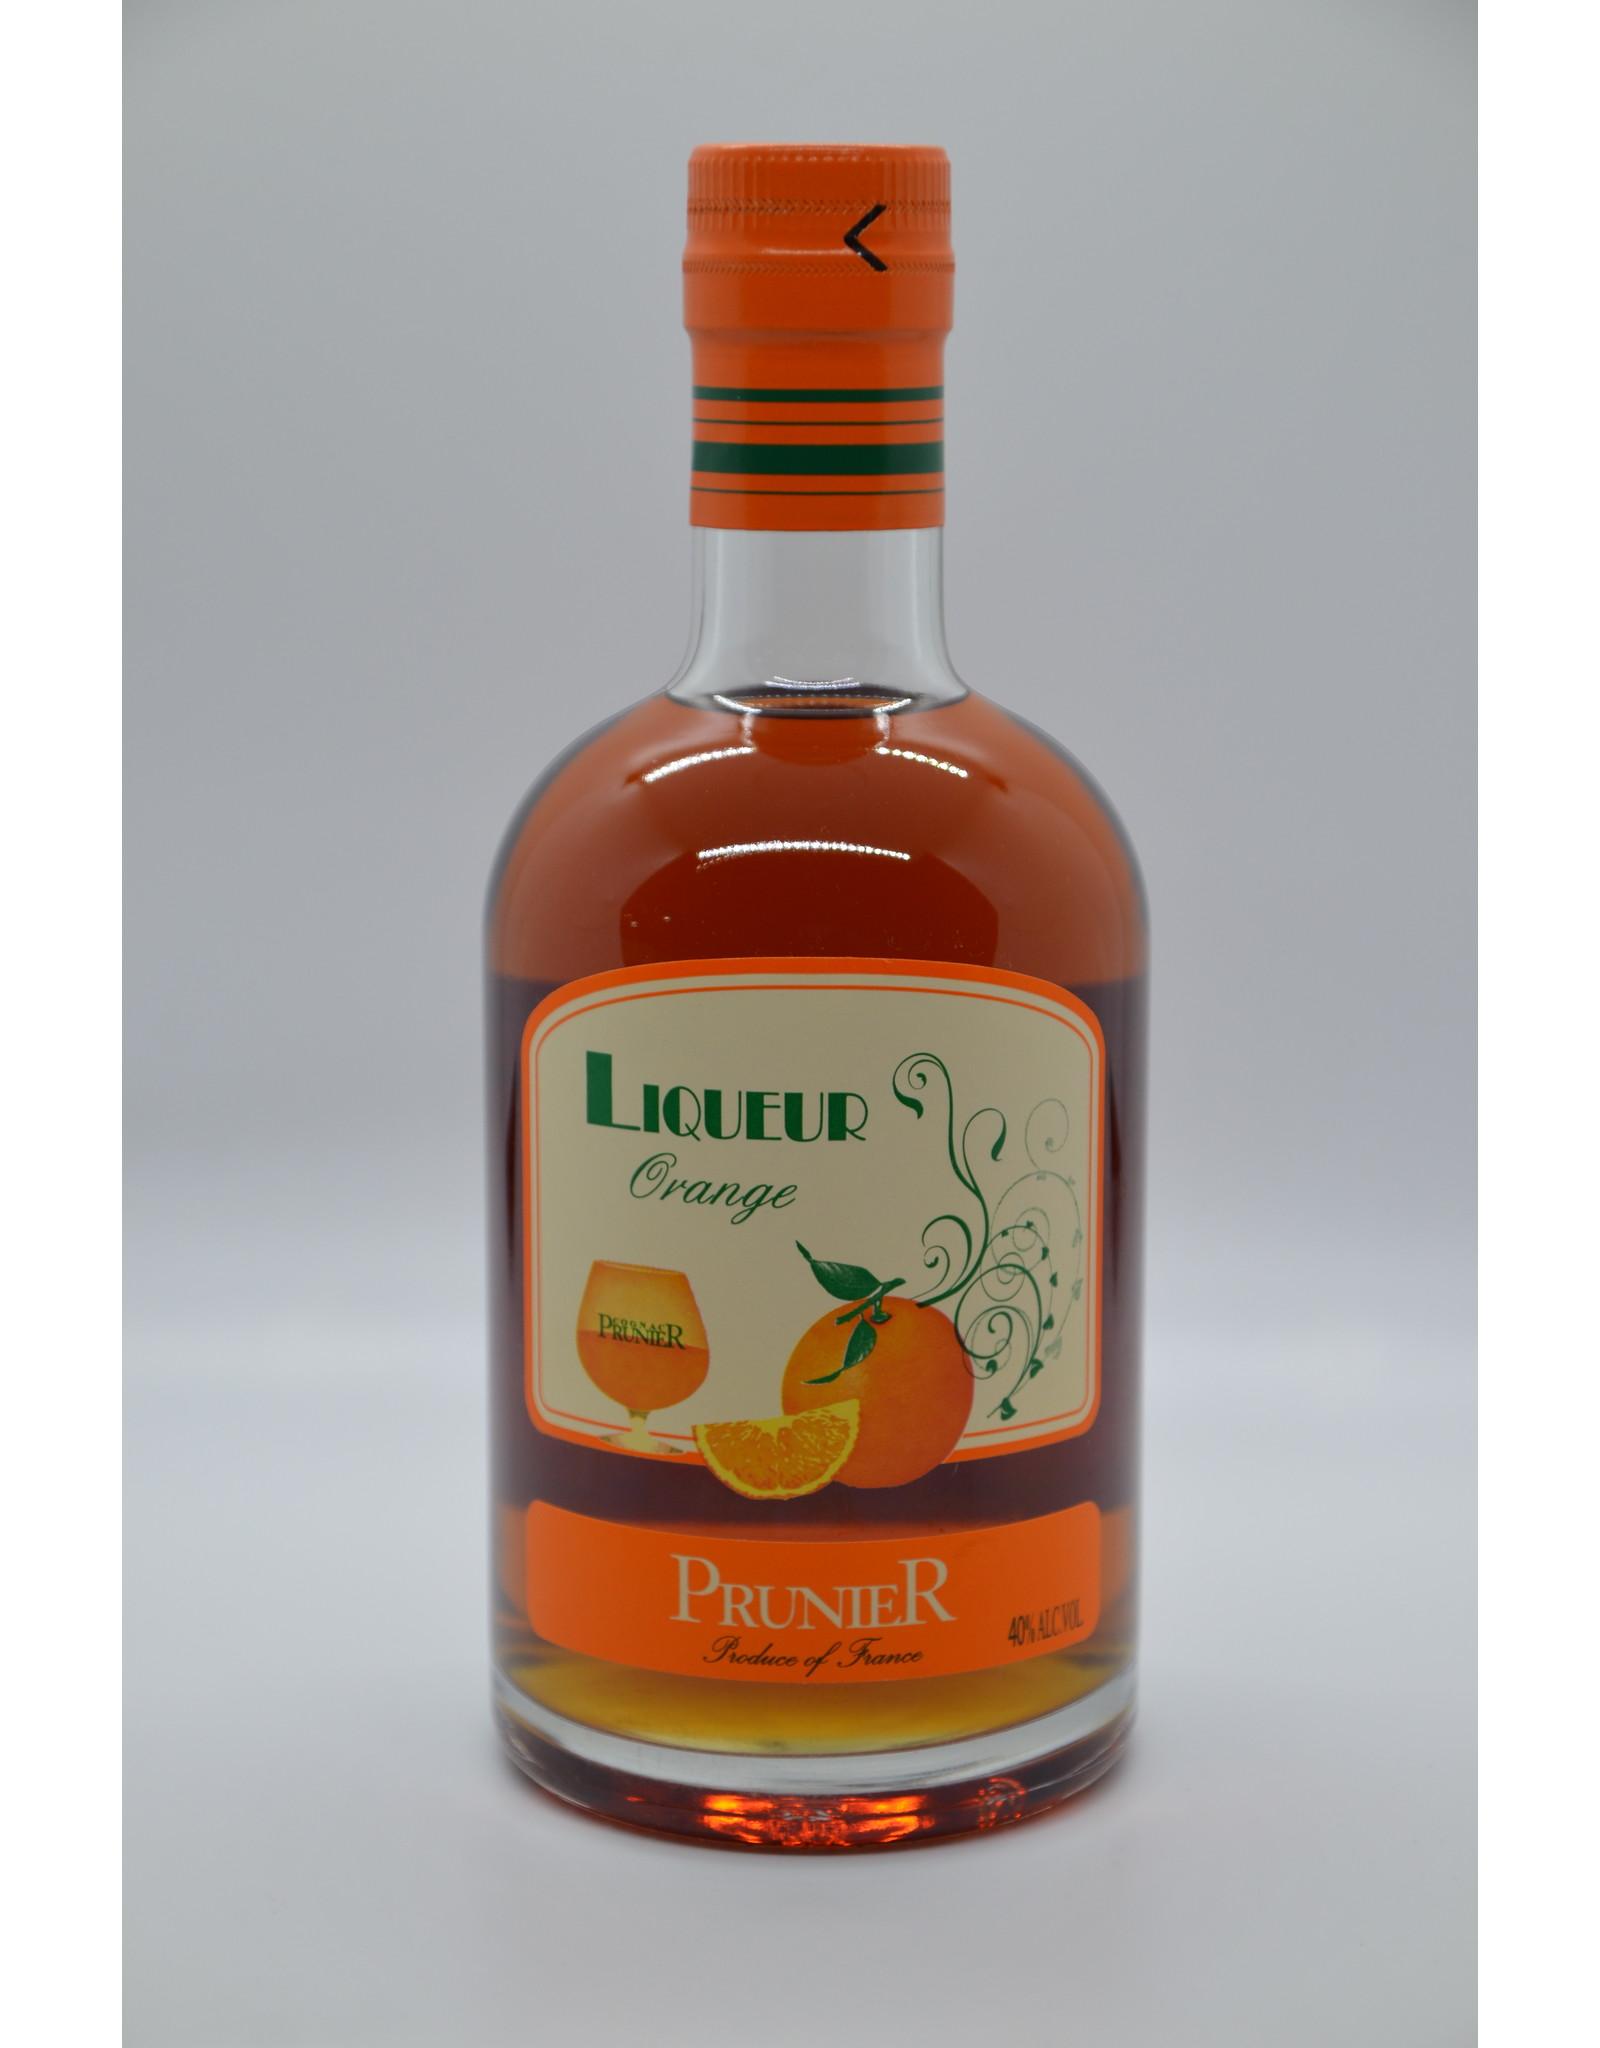 France Prunier Orange Liqueur